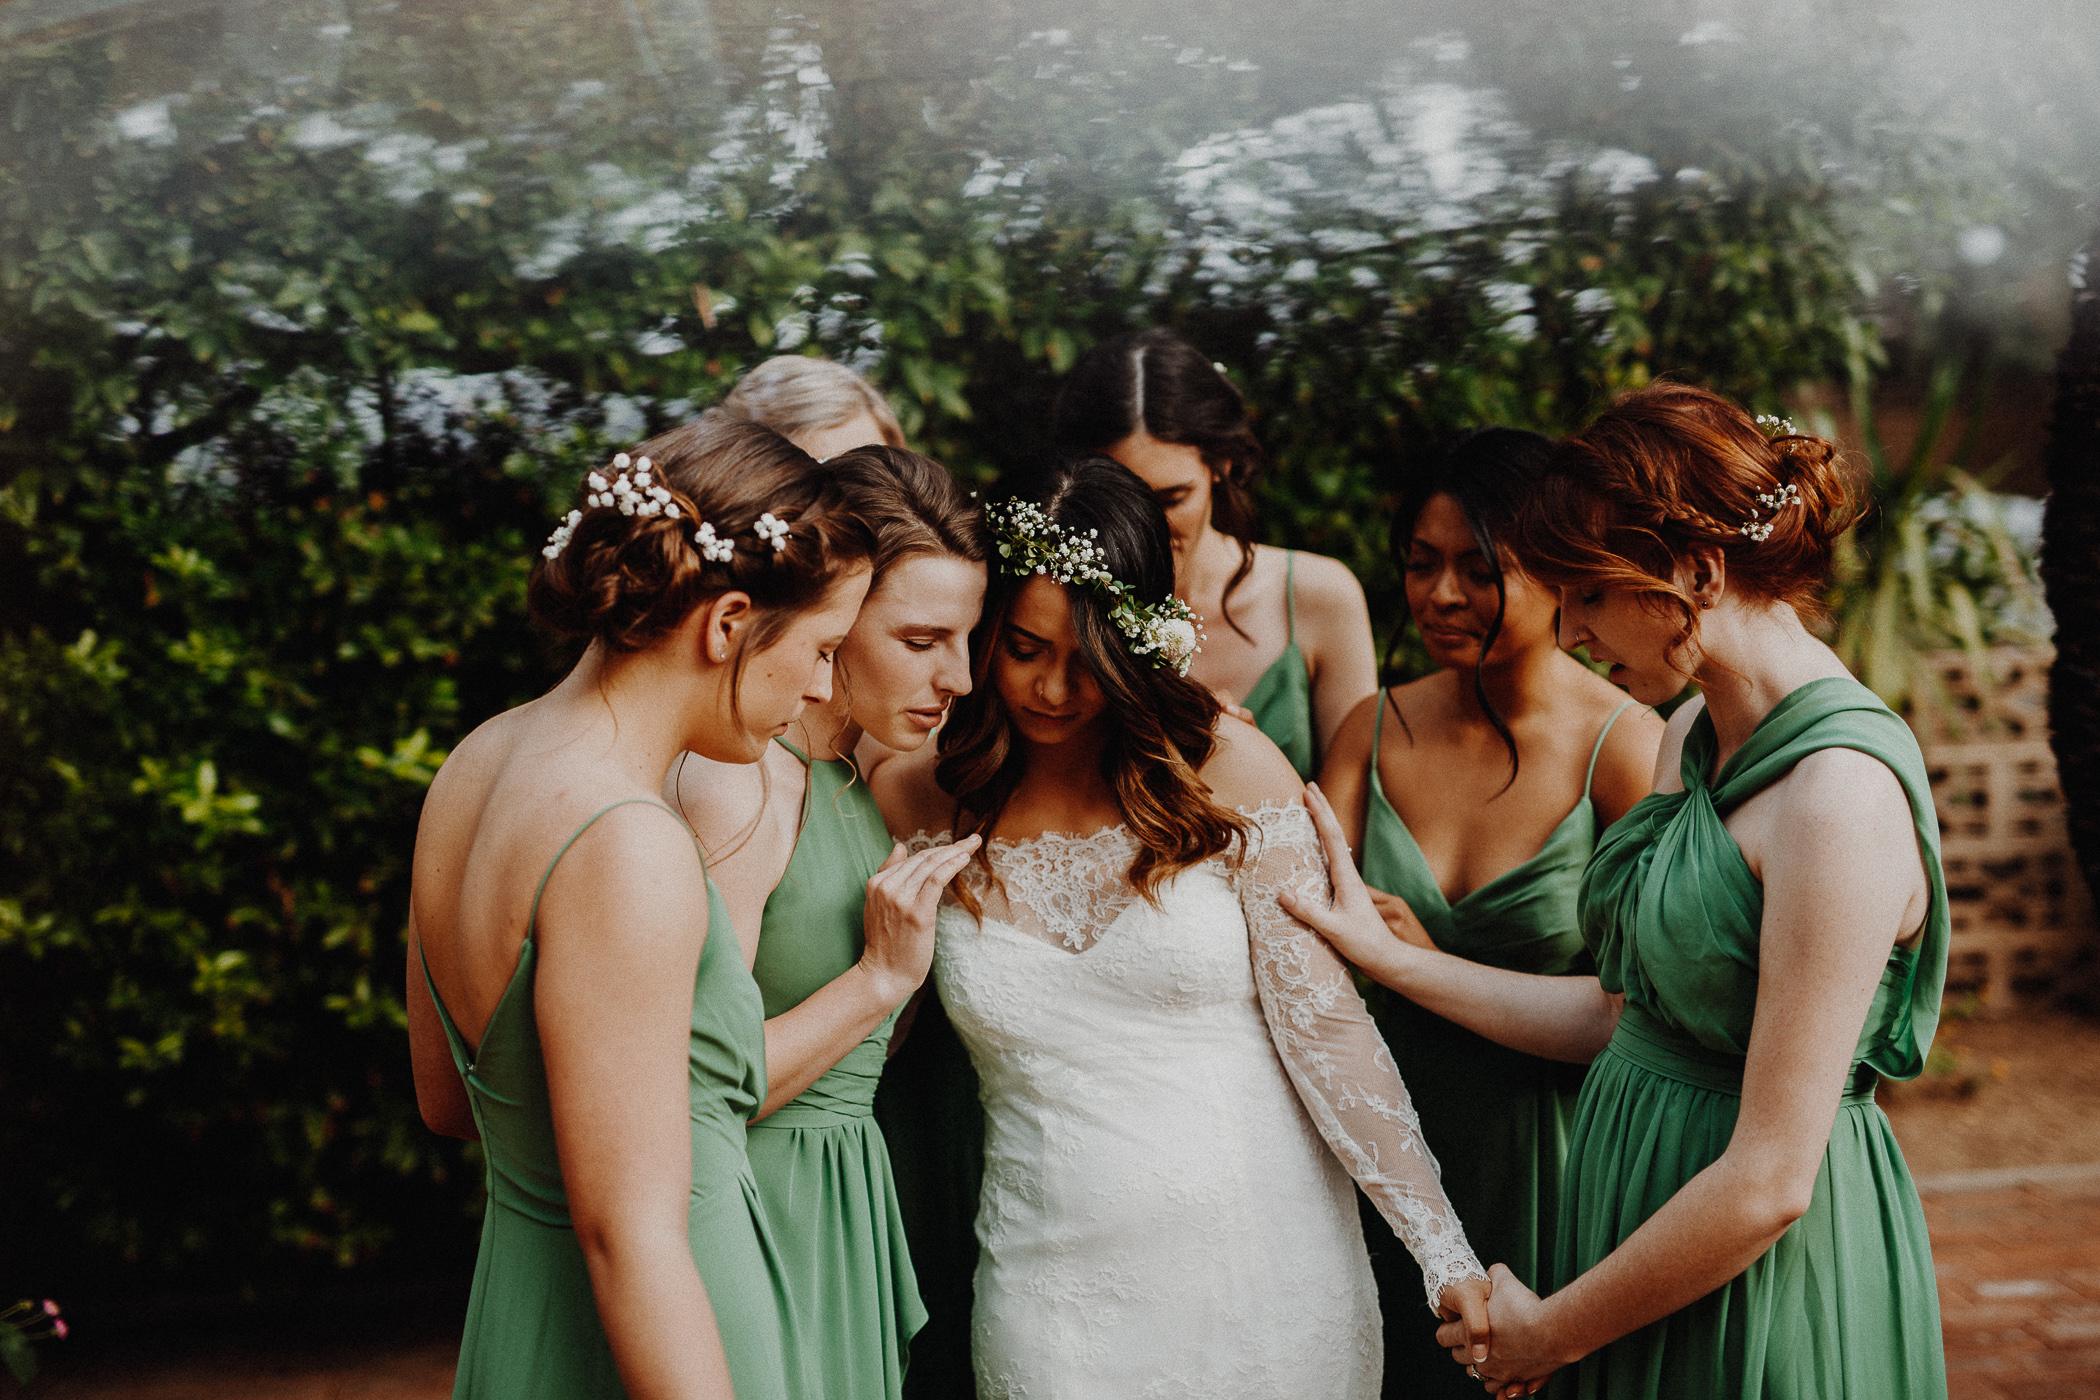 181104-Luxium-Weddings-Arizona-@matt__Le-Brandon-Kariana-Phoenix-Valley-Garden-Center-1046.jpg